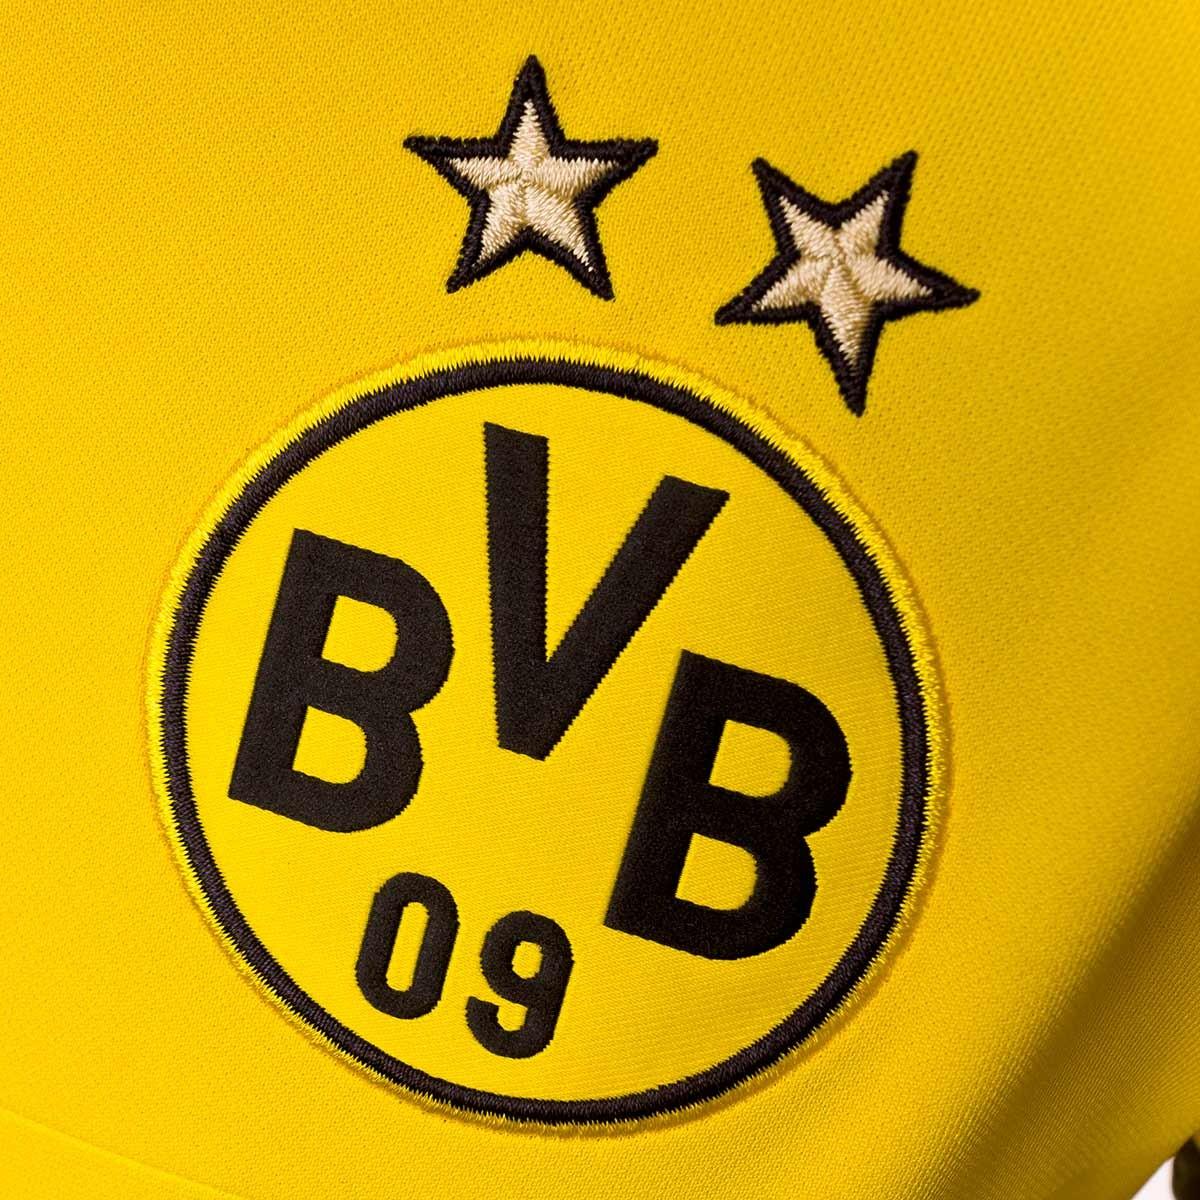 1247e96be0 Camiseta Puma BVB Borussia Dortmund Opel Evonik Primera Equipación 2018-2019  Niño Cyber yellow - Soloporteros es ahora Fútbol Emotion